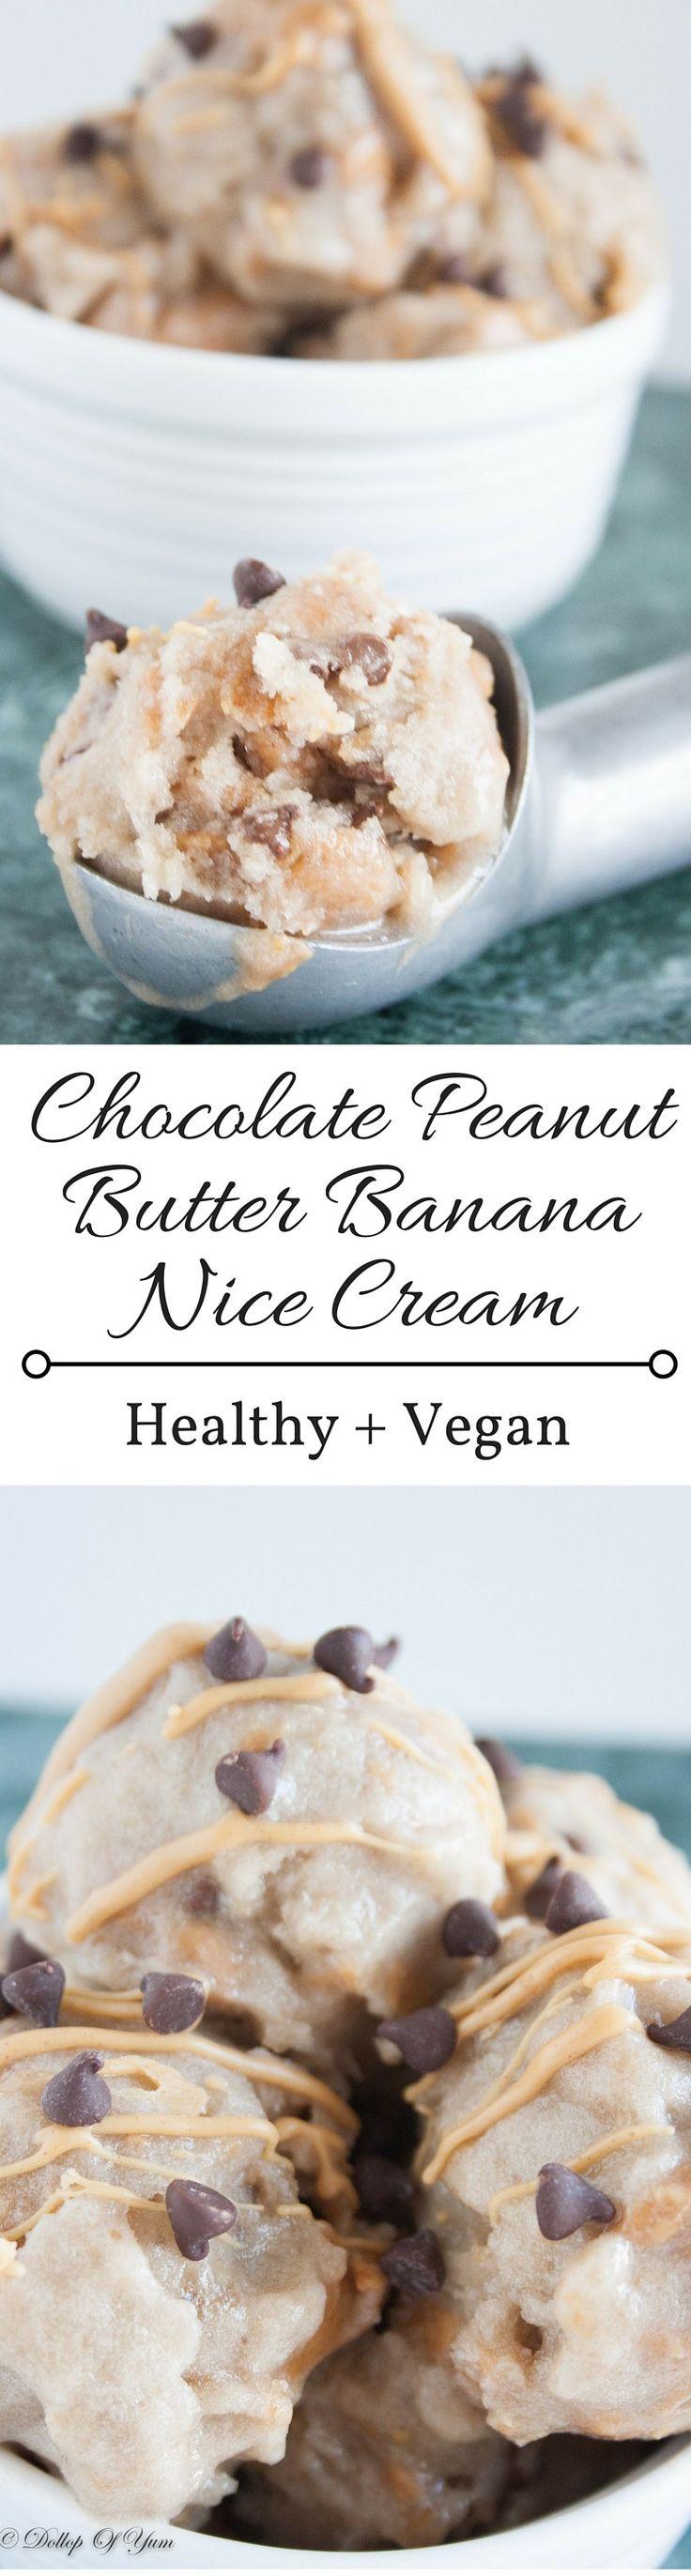 Chocolate Peanut Butter Banana Nice Cream. A decadent dessert that is healthy, vegan, gluten free, and dairy free!